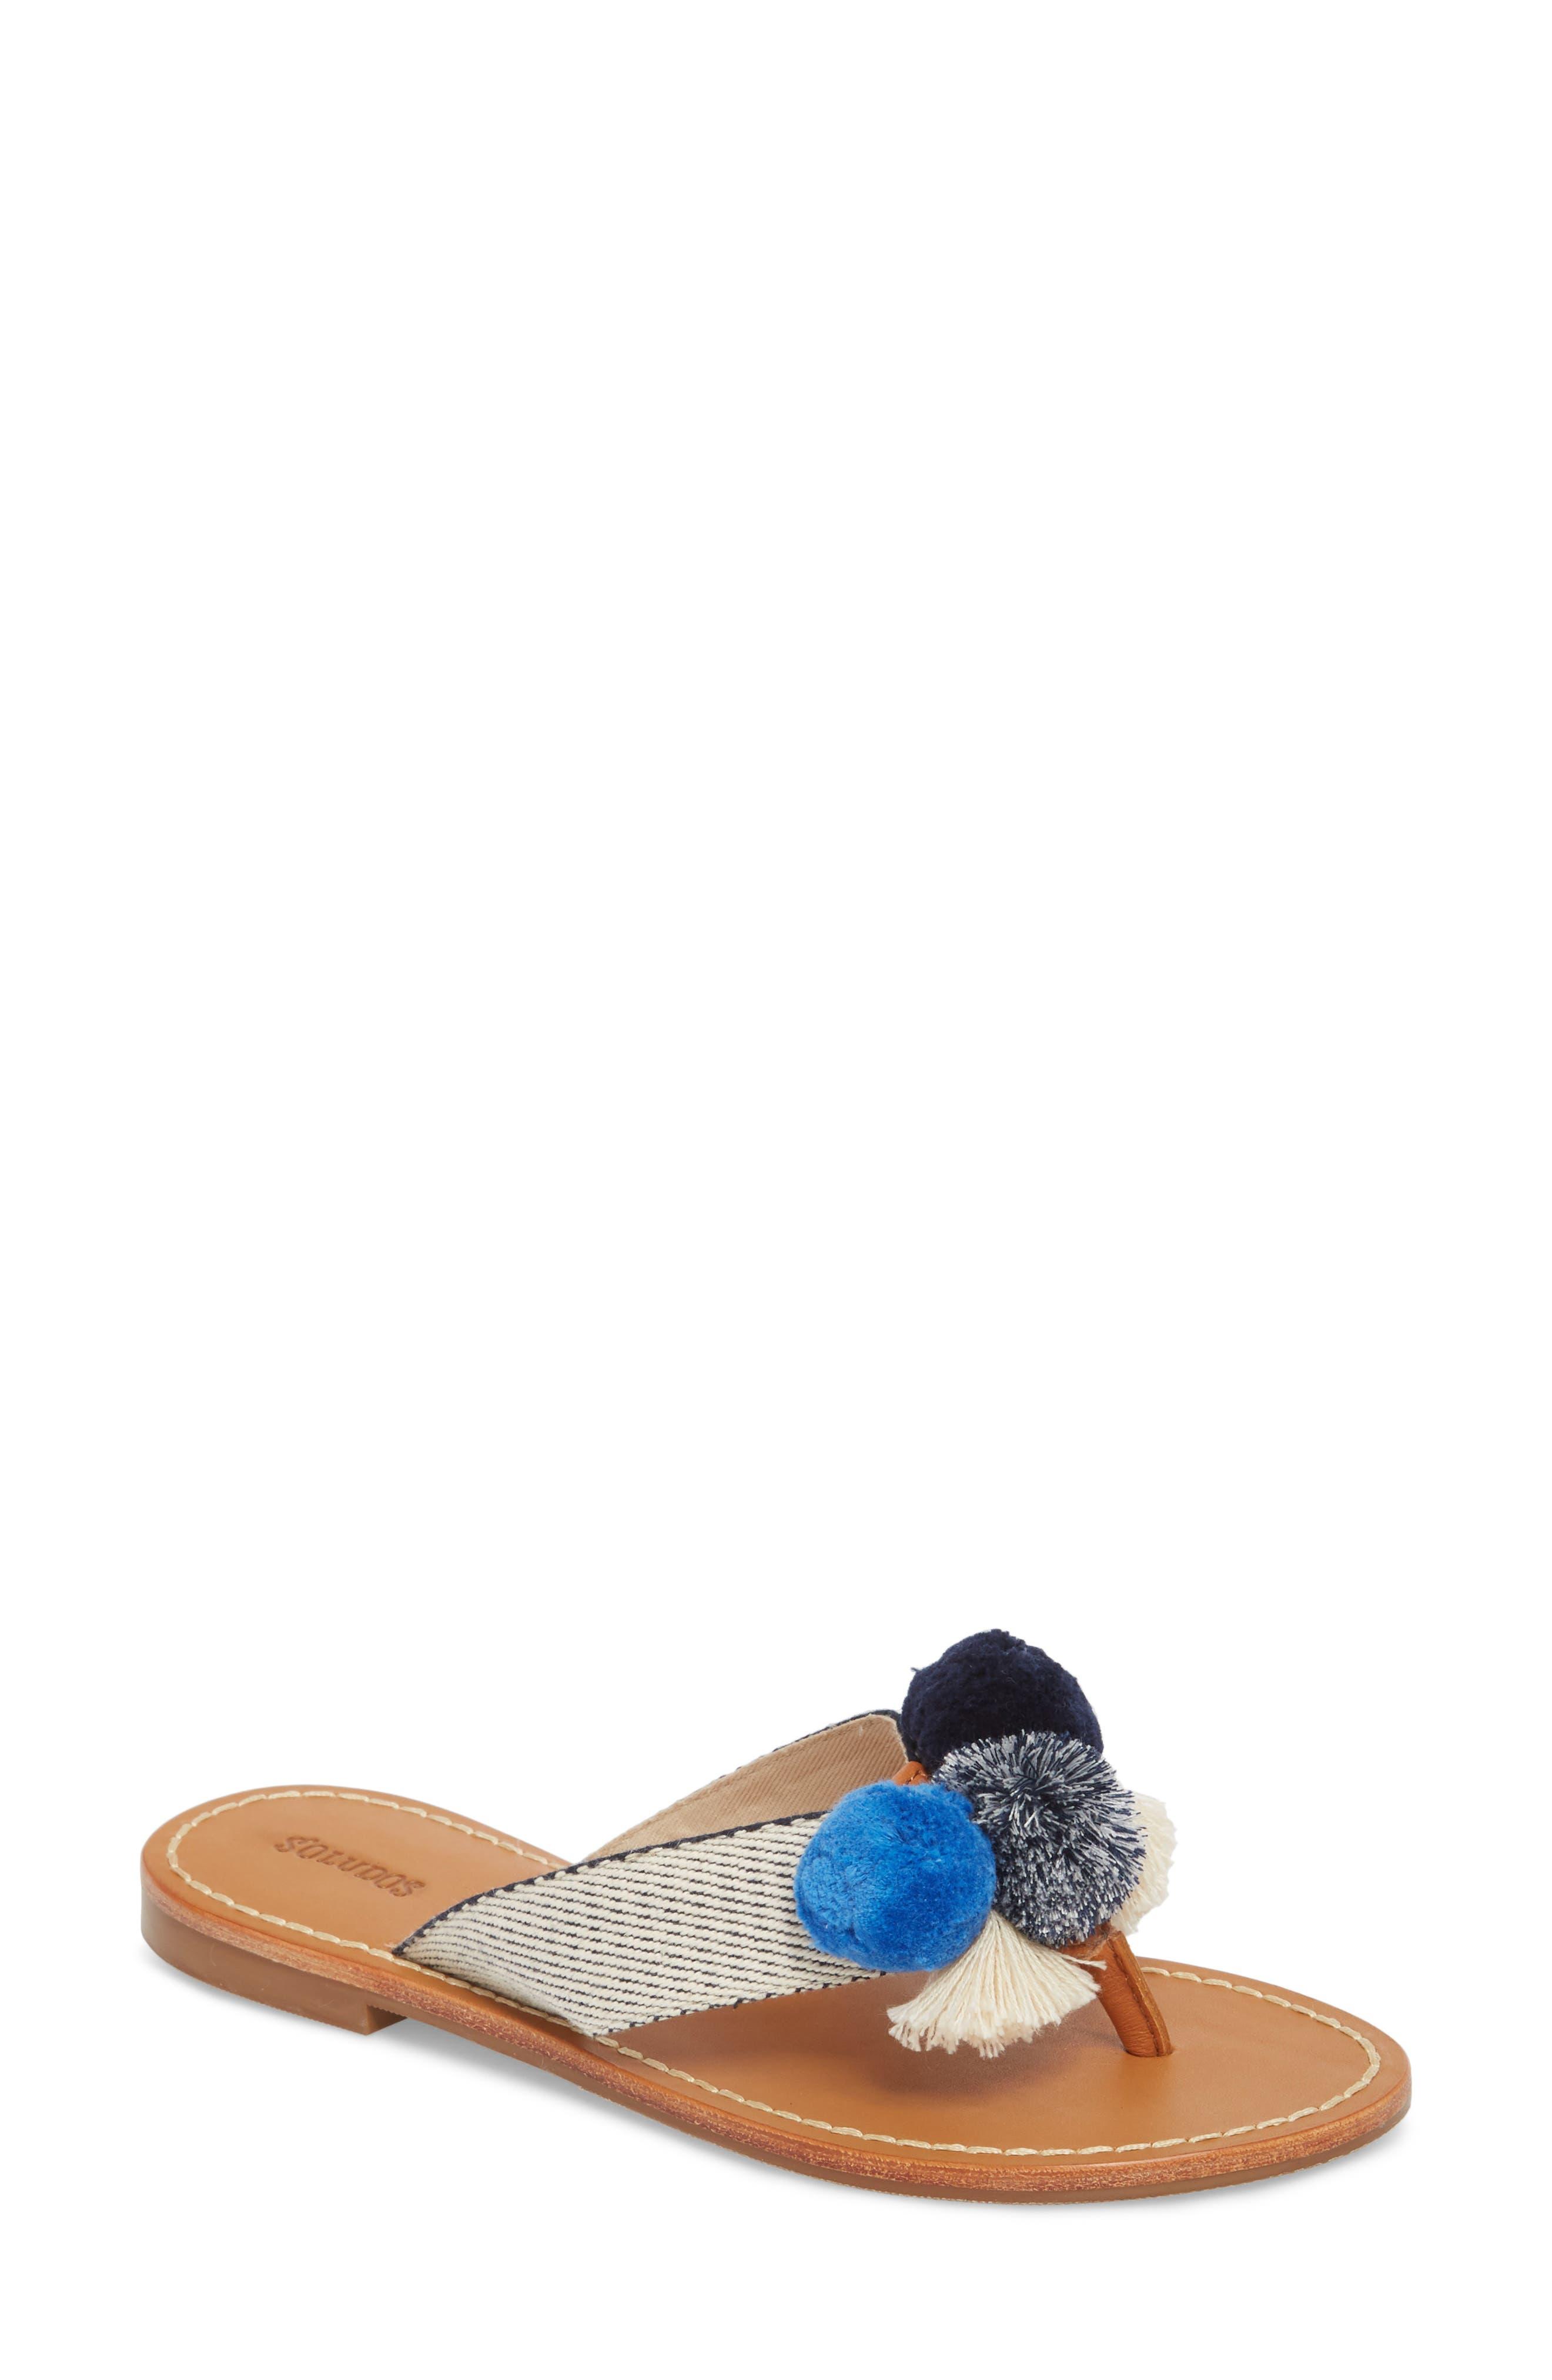 Capri Pompom Flip Flop,                         Main,                         color, Navy/ Natural